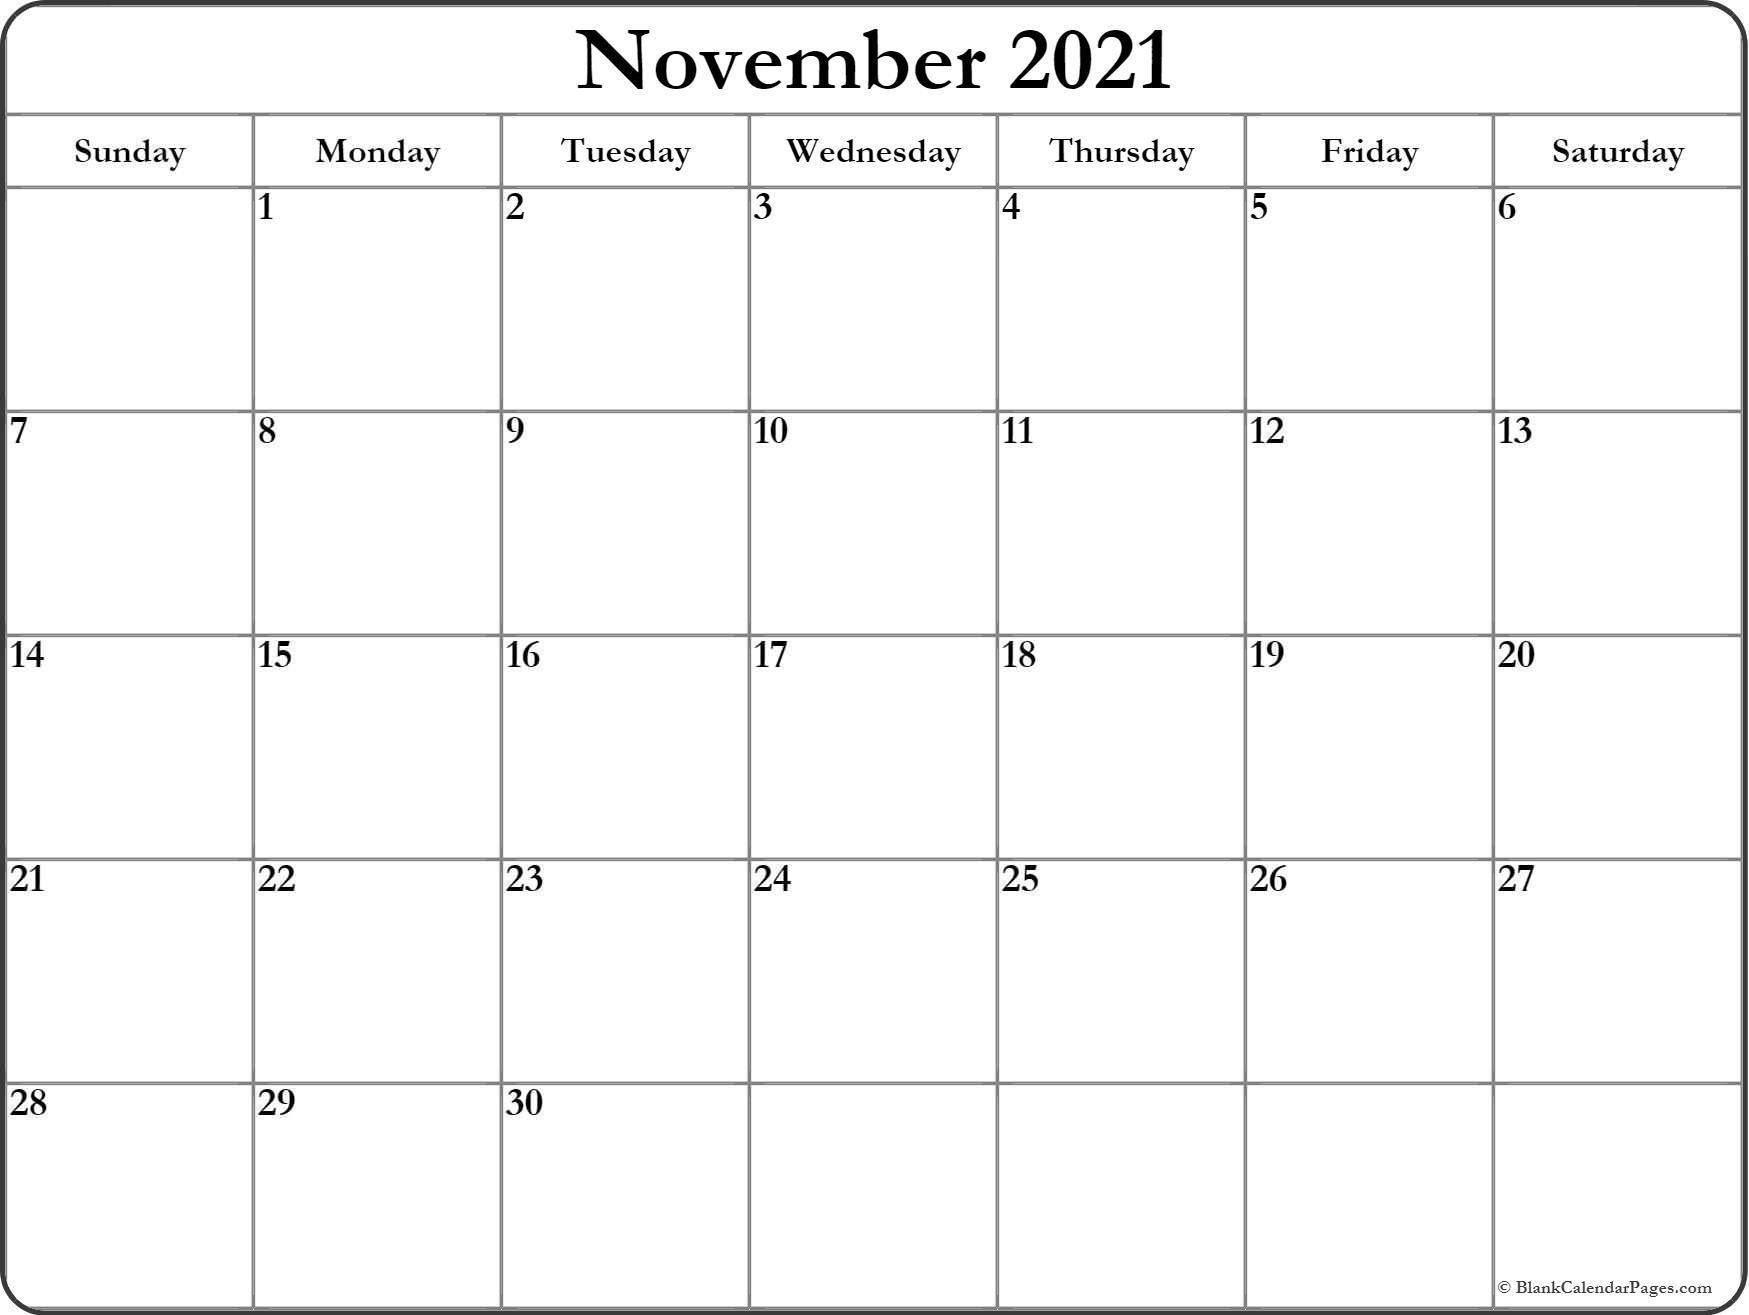 November 2021 Calendar | Free Printable Monthly Calendars  2021 Free Printable Calendars Without Downloading November